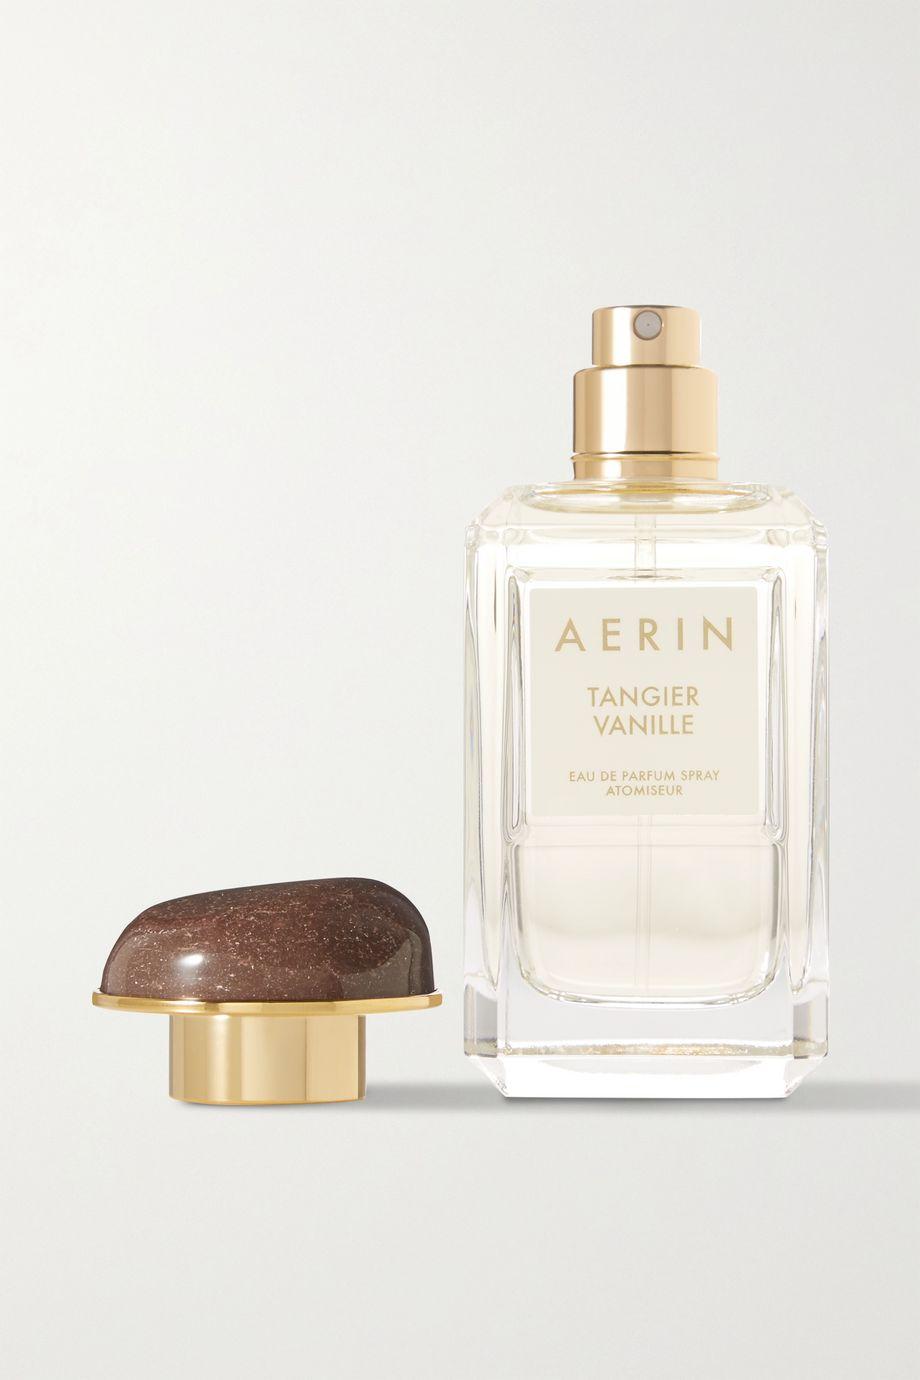 AERIN Beauty Tangier Vanille – Vanille & Amber, 50 ml – Eau de Parfum